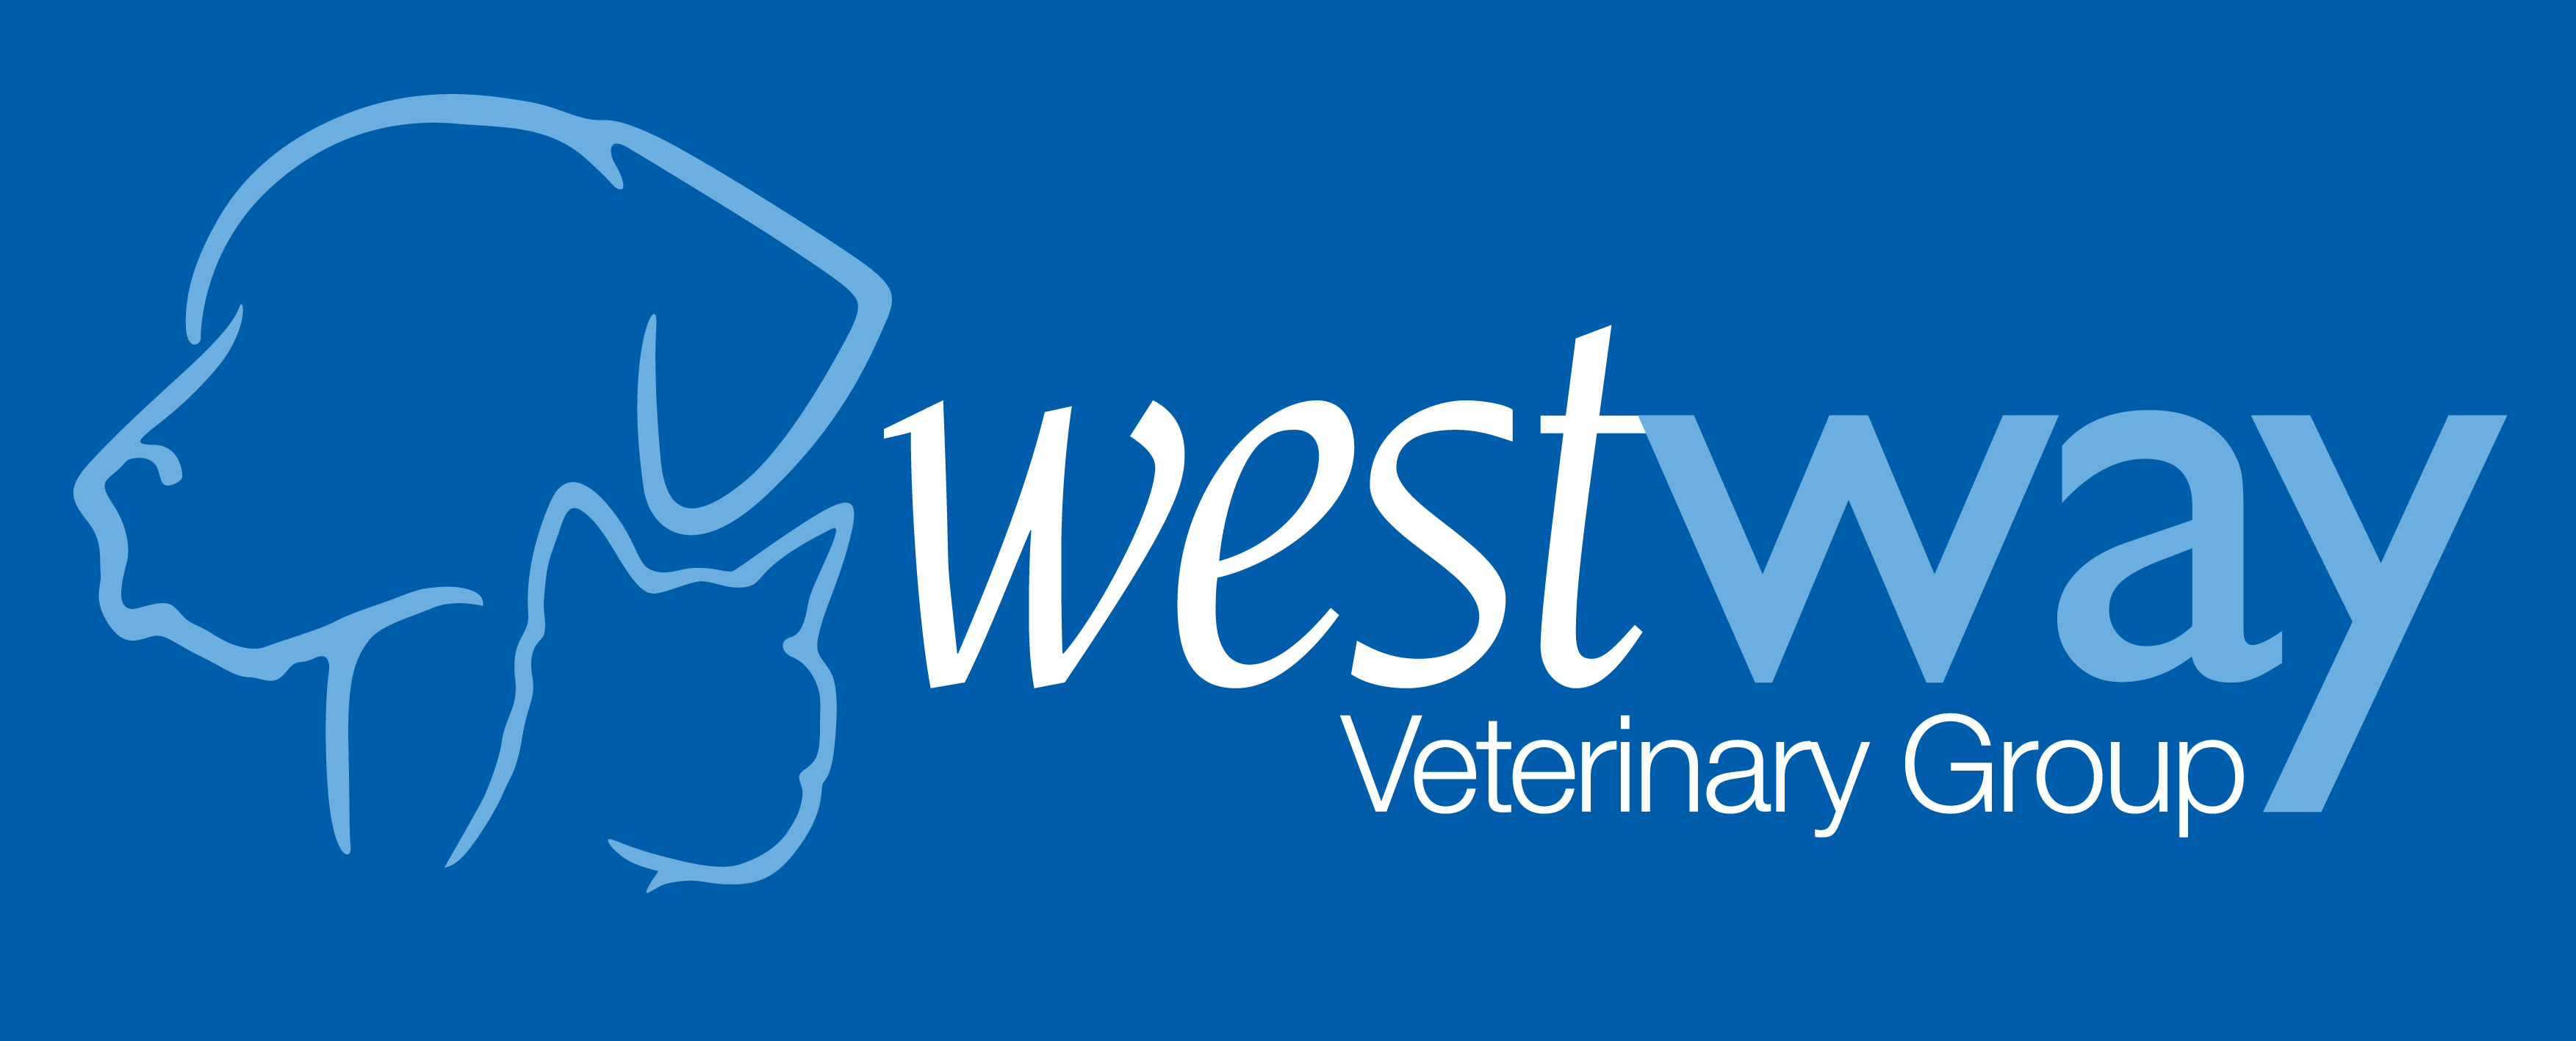 Westway Veterinary Group, Houghton